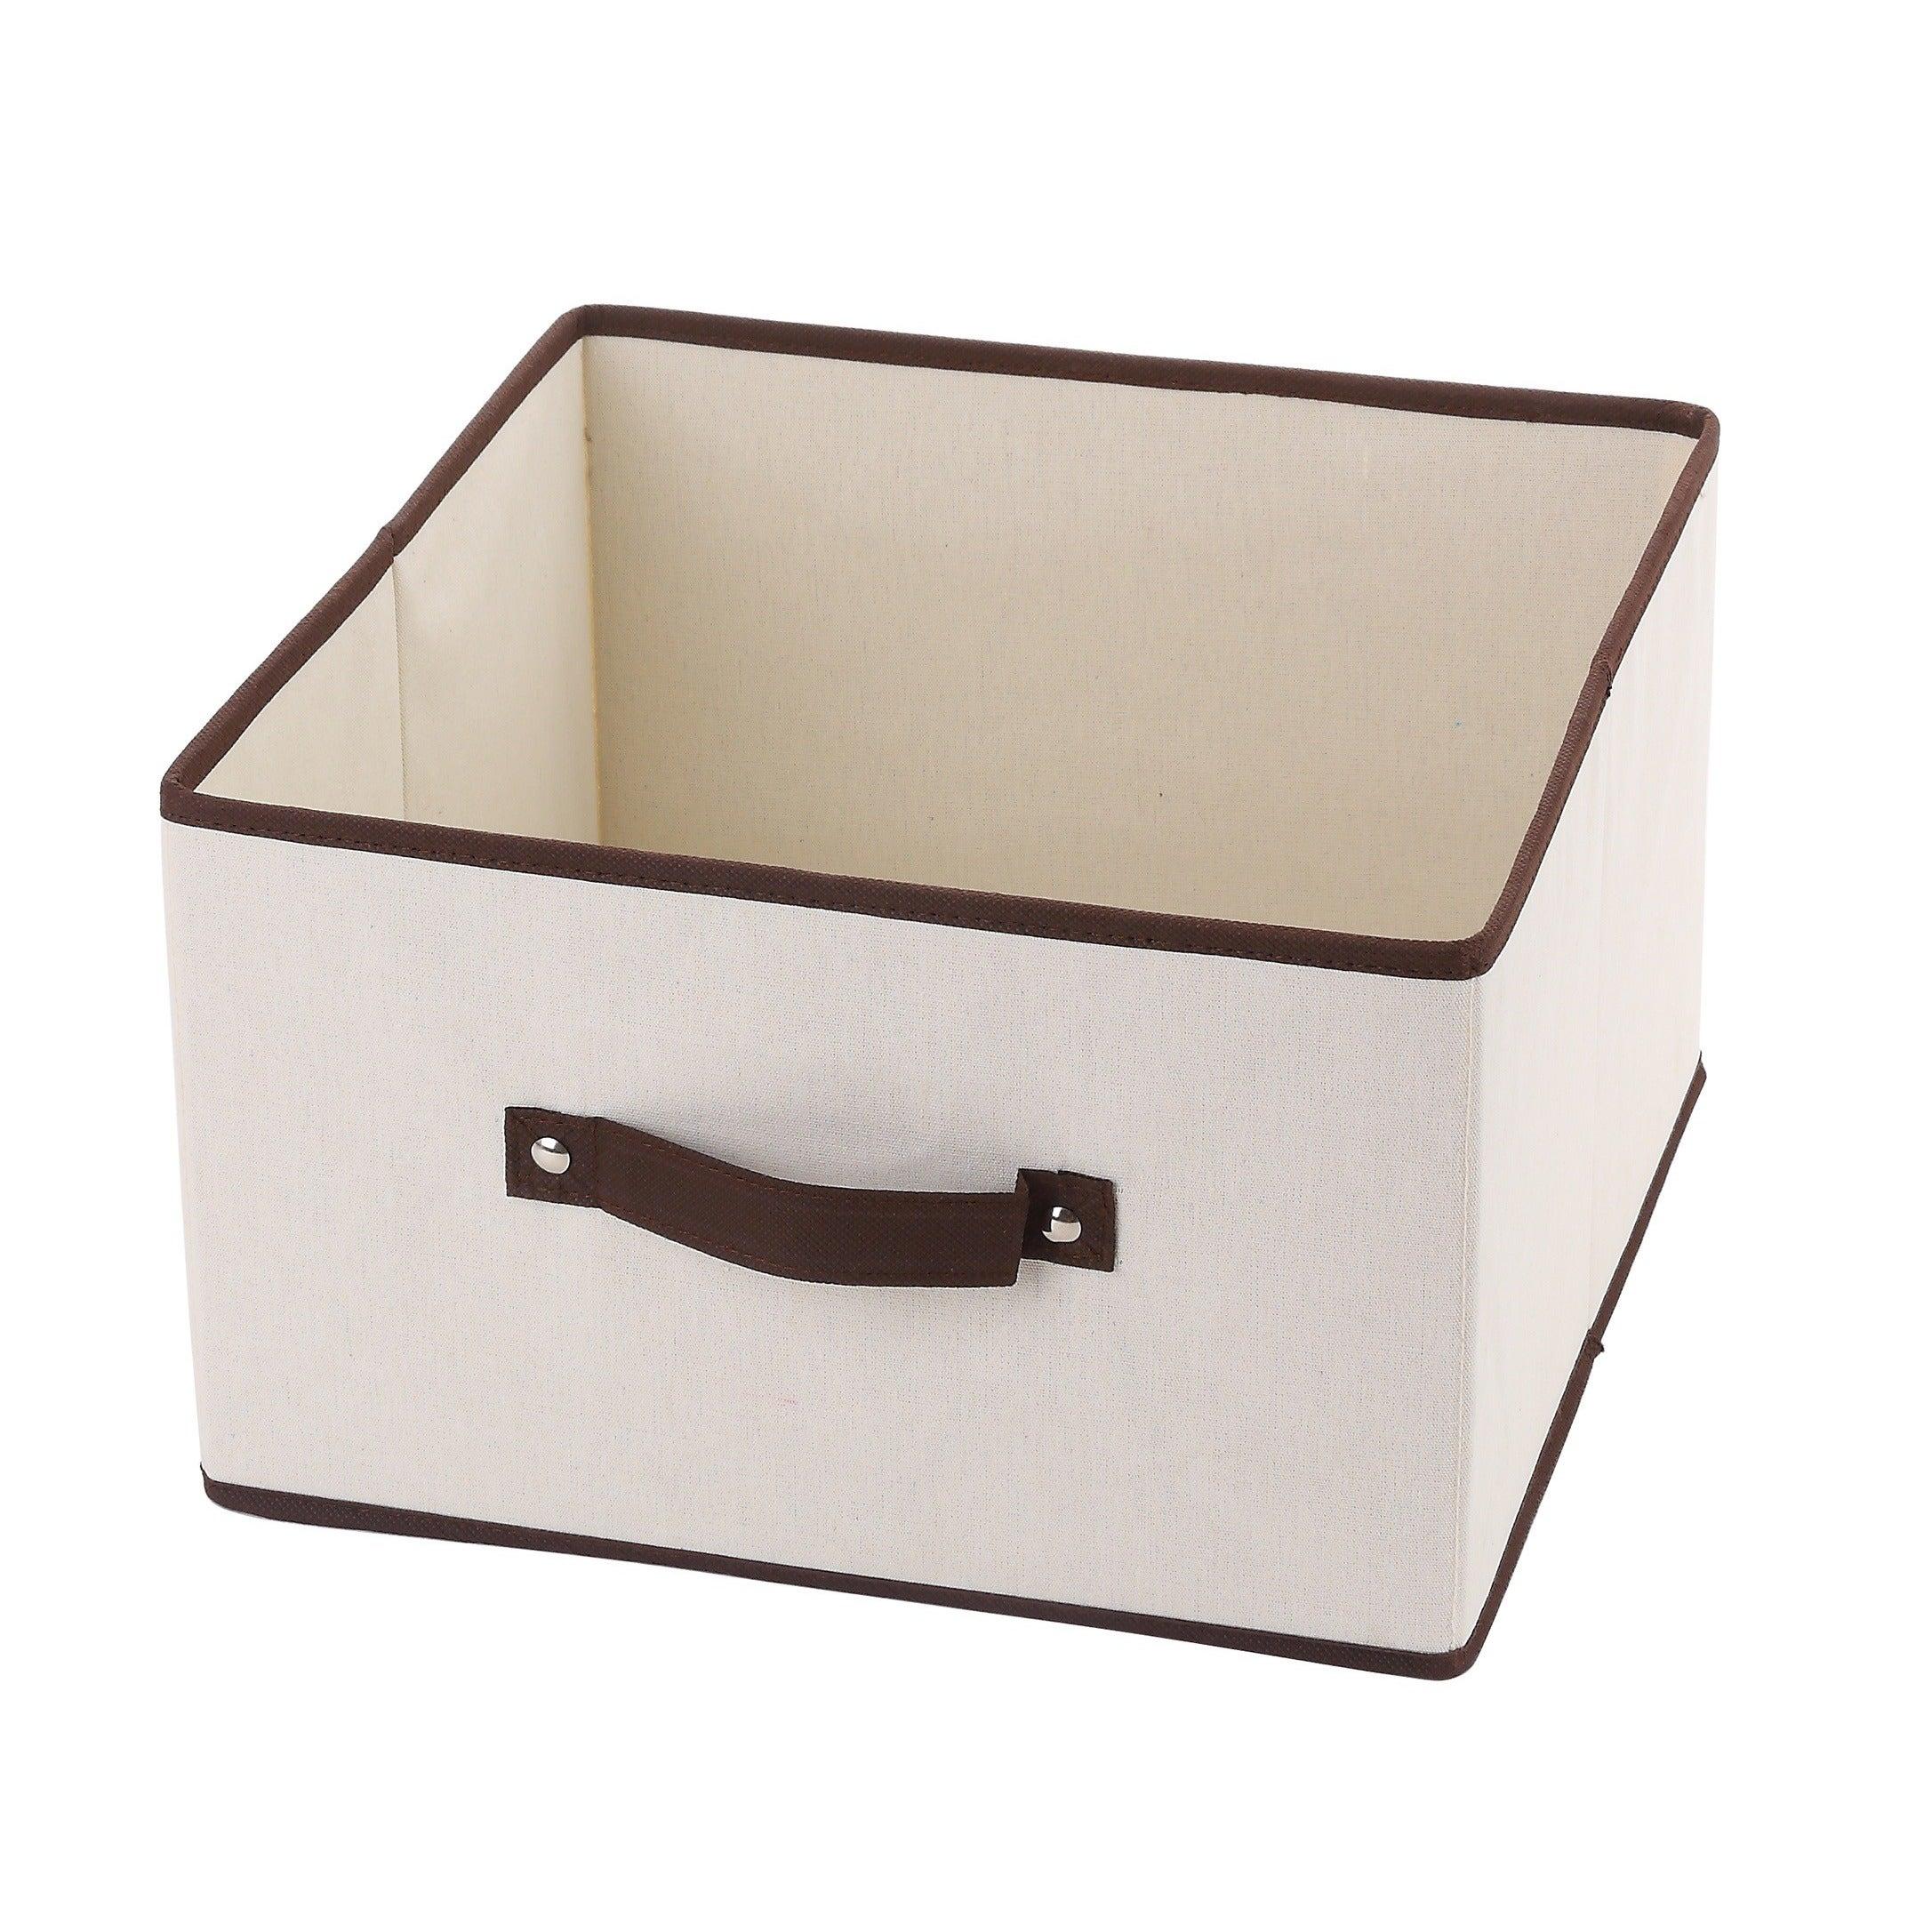 Fabric Closet Dresser Drawer Storage Foldable Organizer Cube Basket Bin Natural Brown Trim 2197 Medium Overstock 16687006